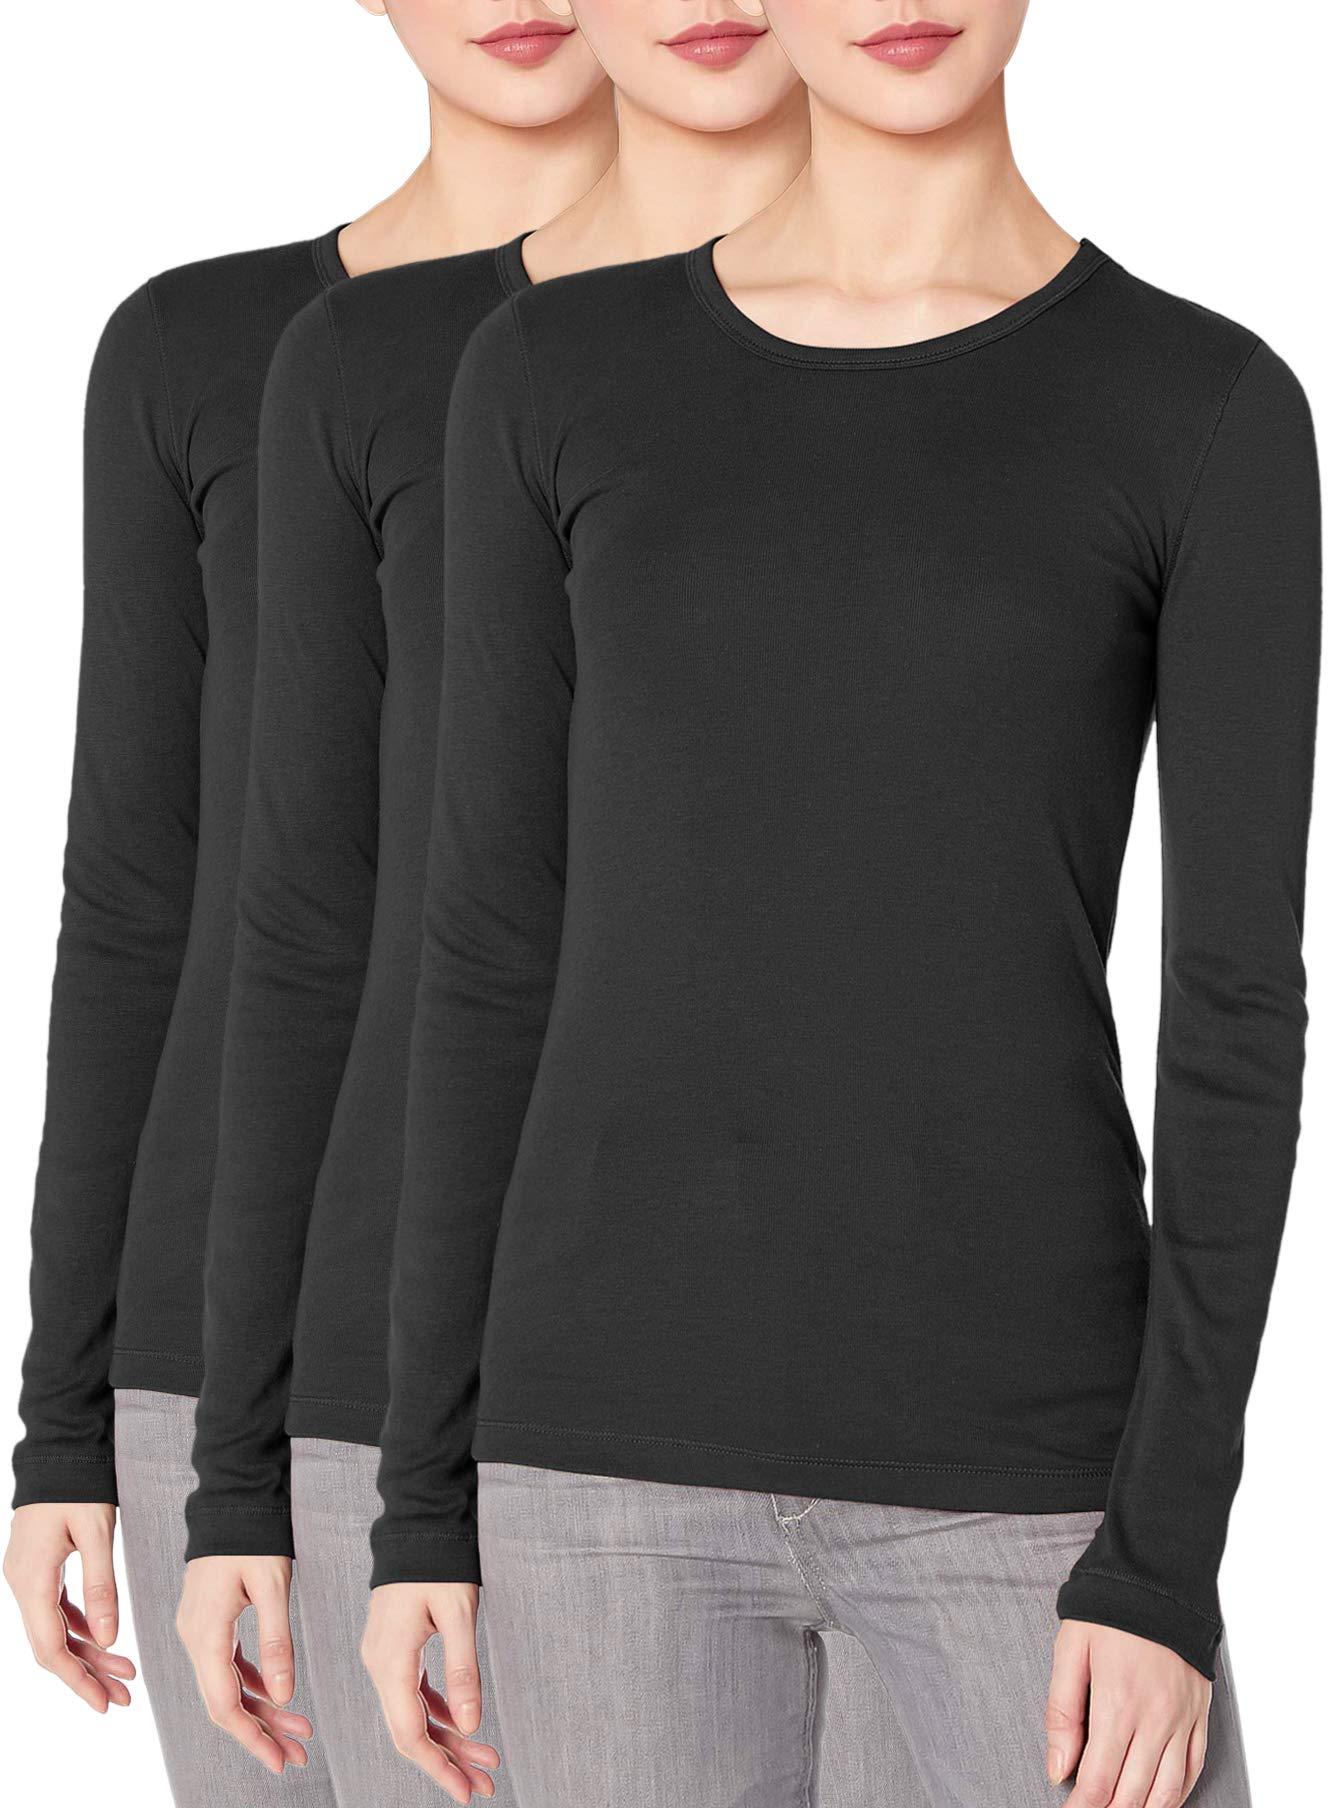 TAIPOVE Women's Long Sleeve Shirts Tops Crewneck Lightweight Underscrub Tees Basic Layer T-Shirt Undershirt 2/3 Packs